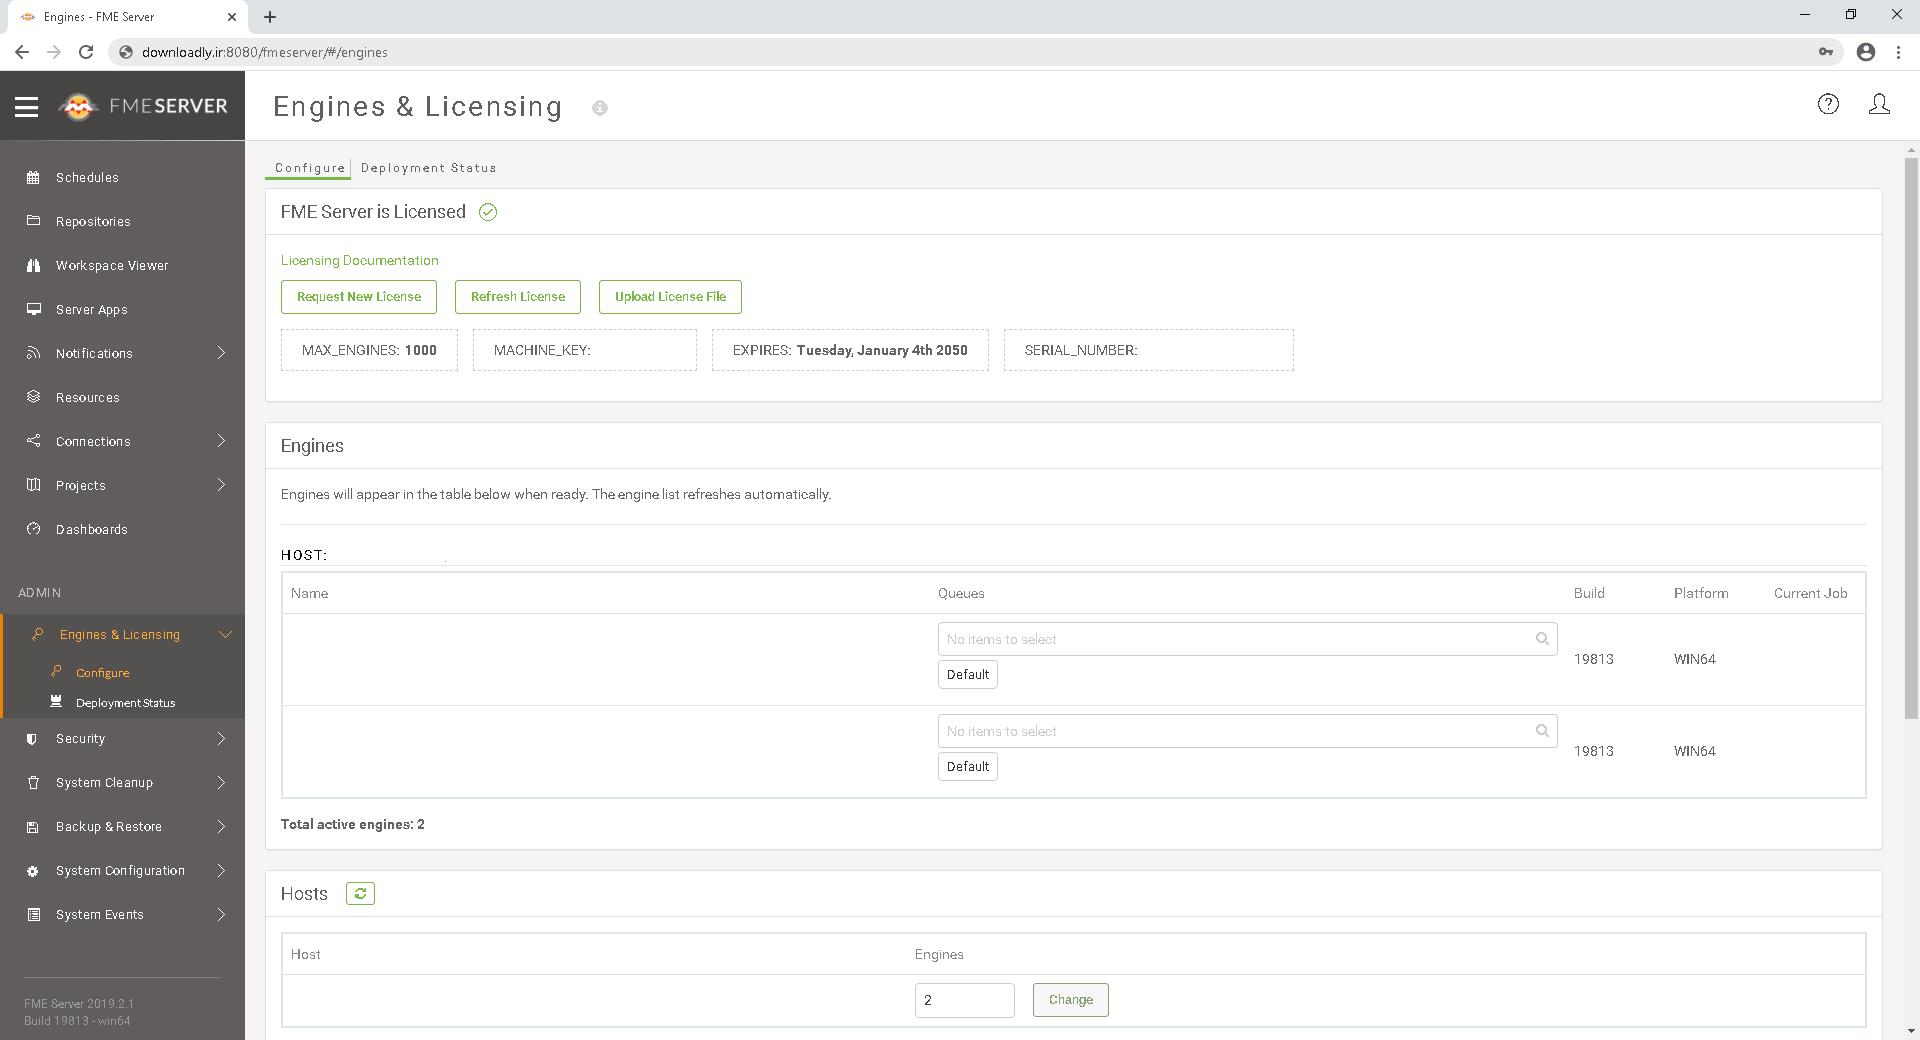 FME Server screenshot